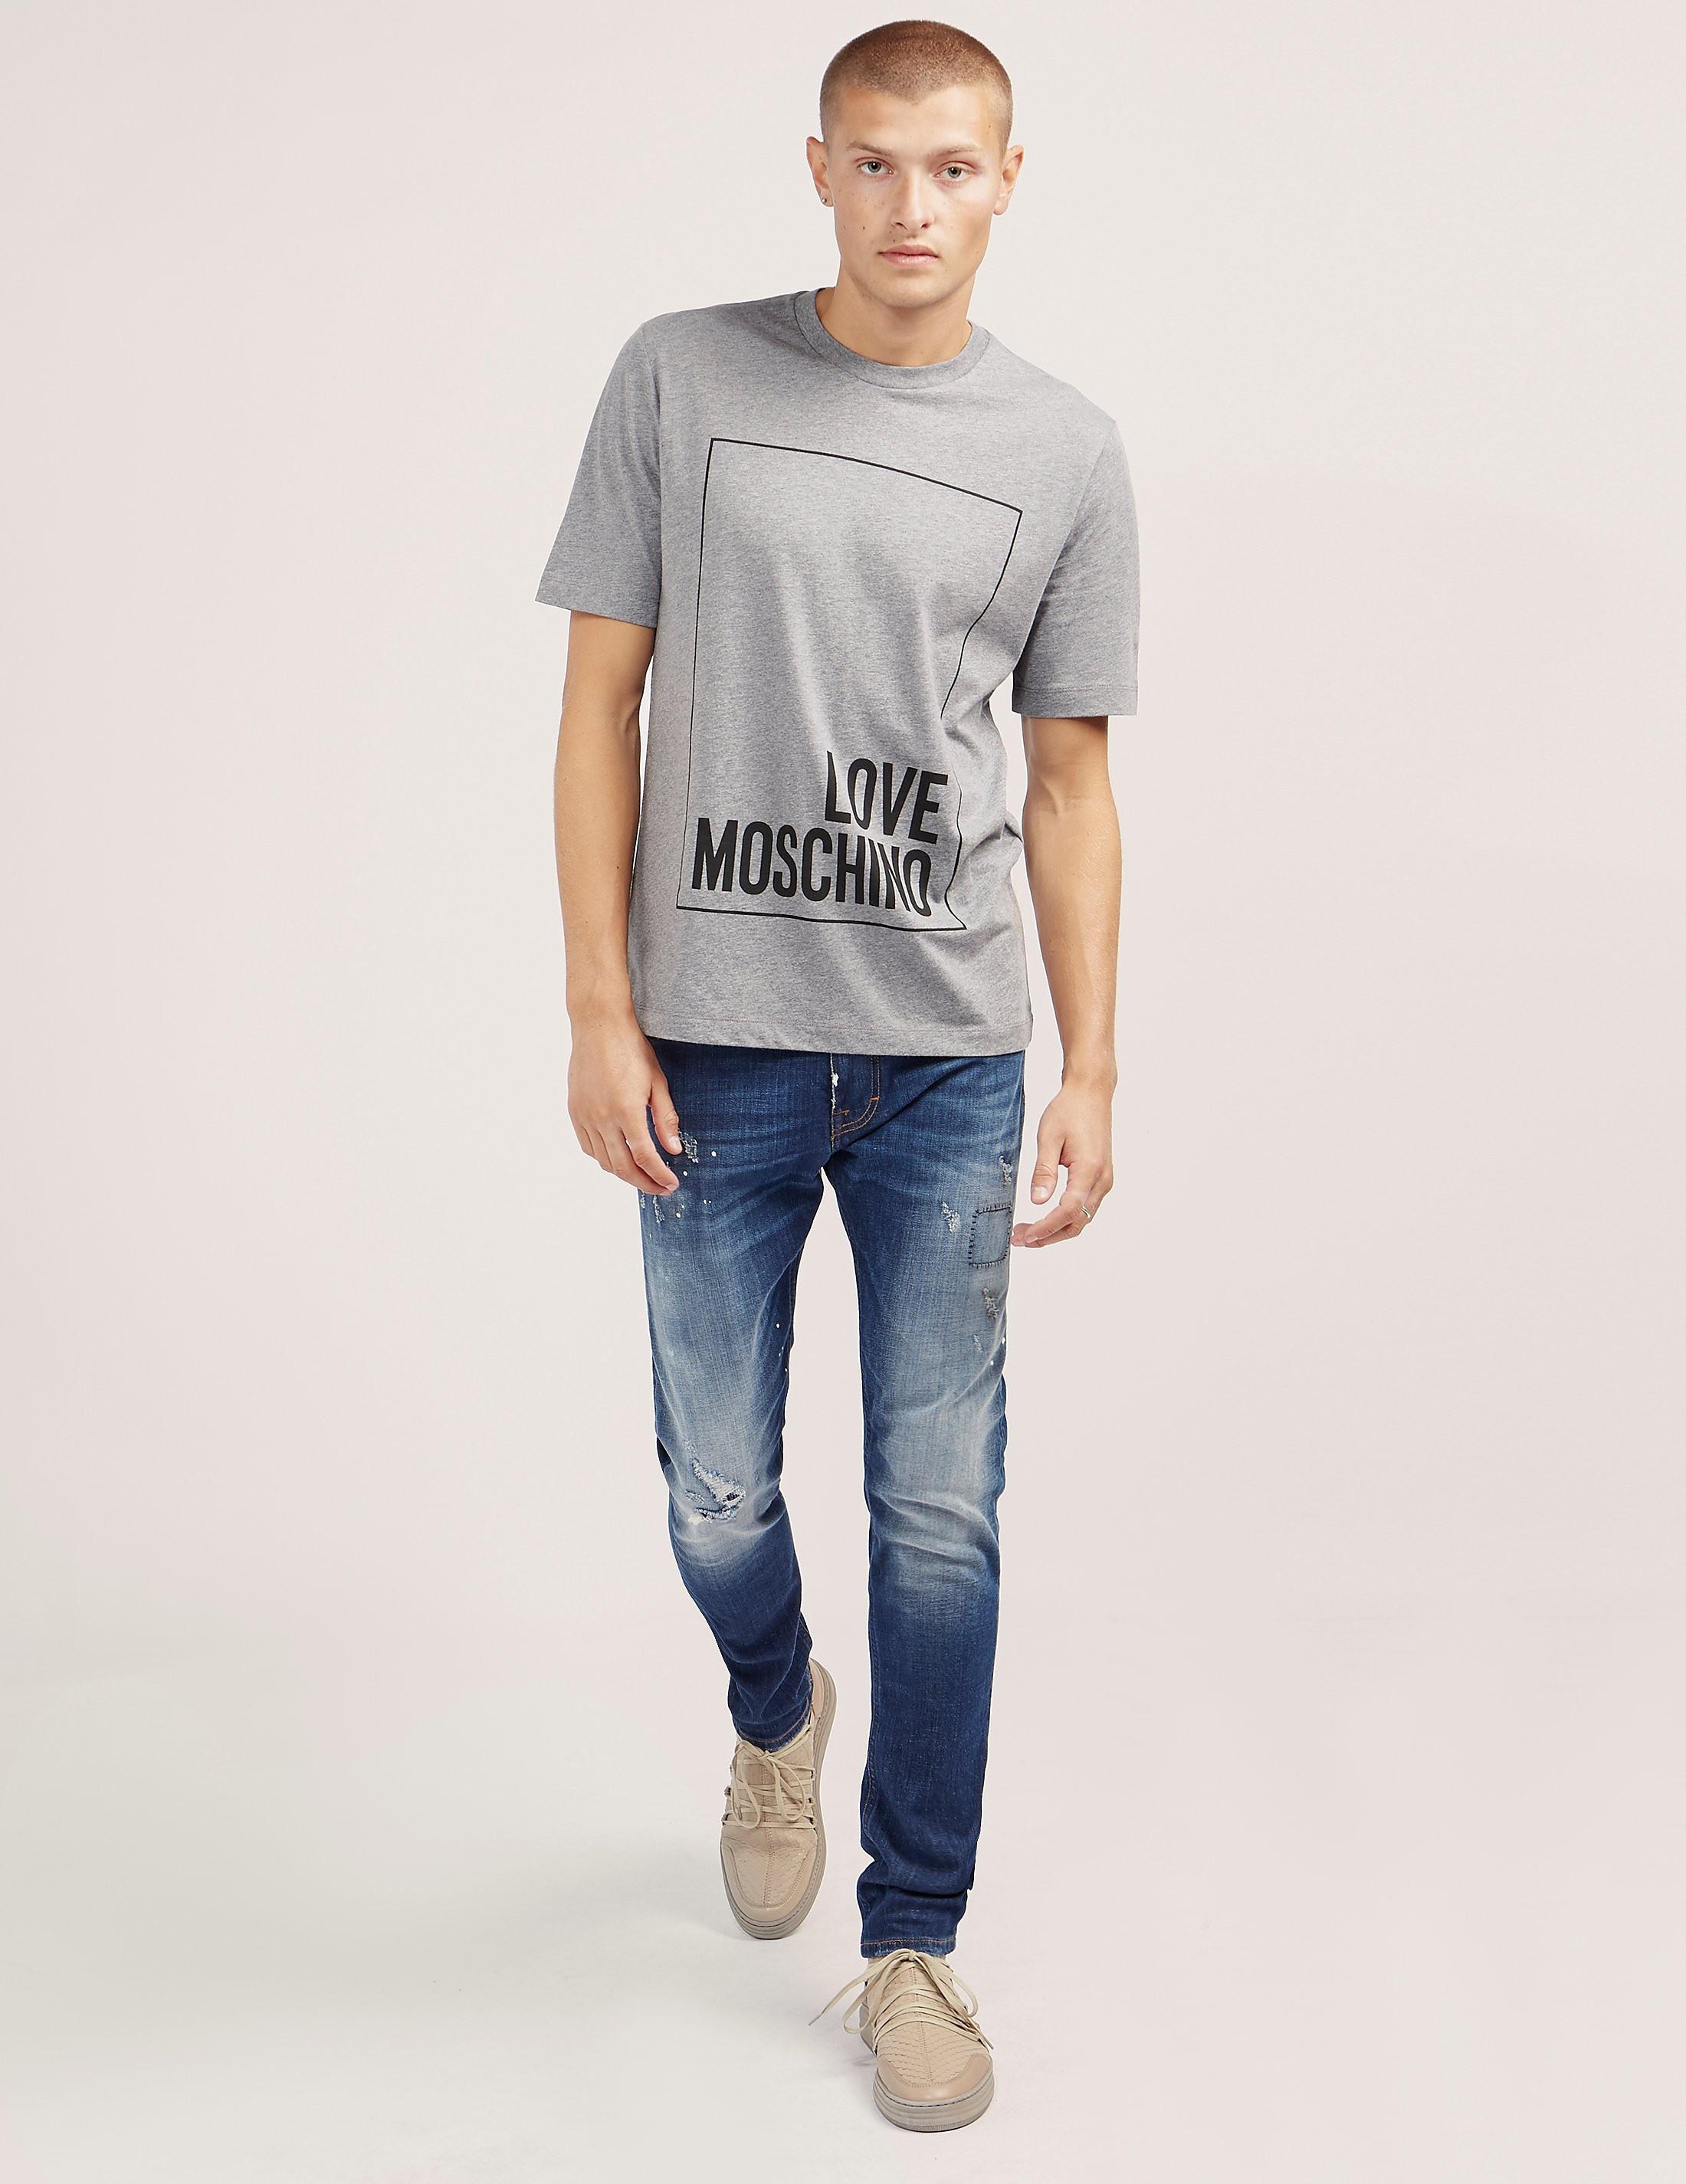 Love Moschino Large Box Short Sleeve T-Shirt